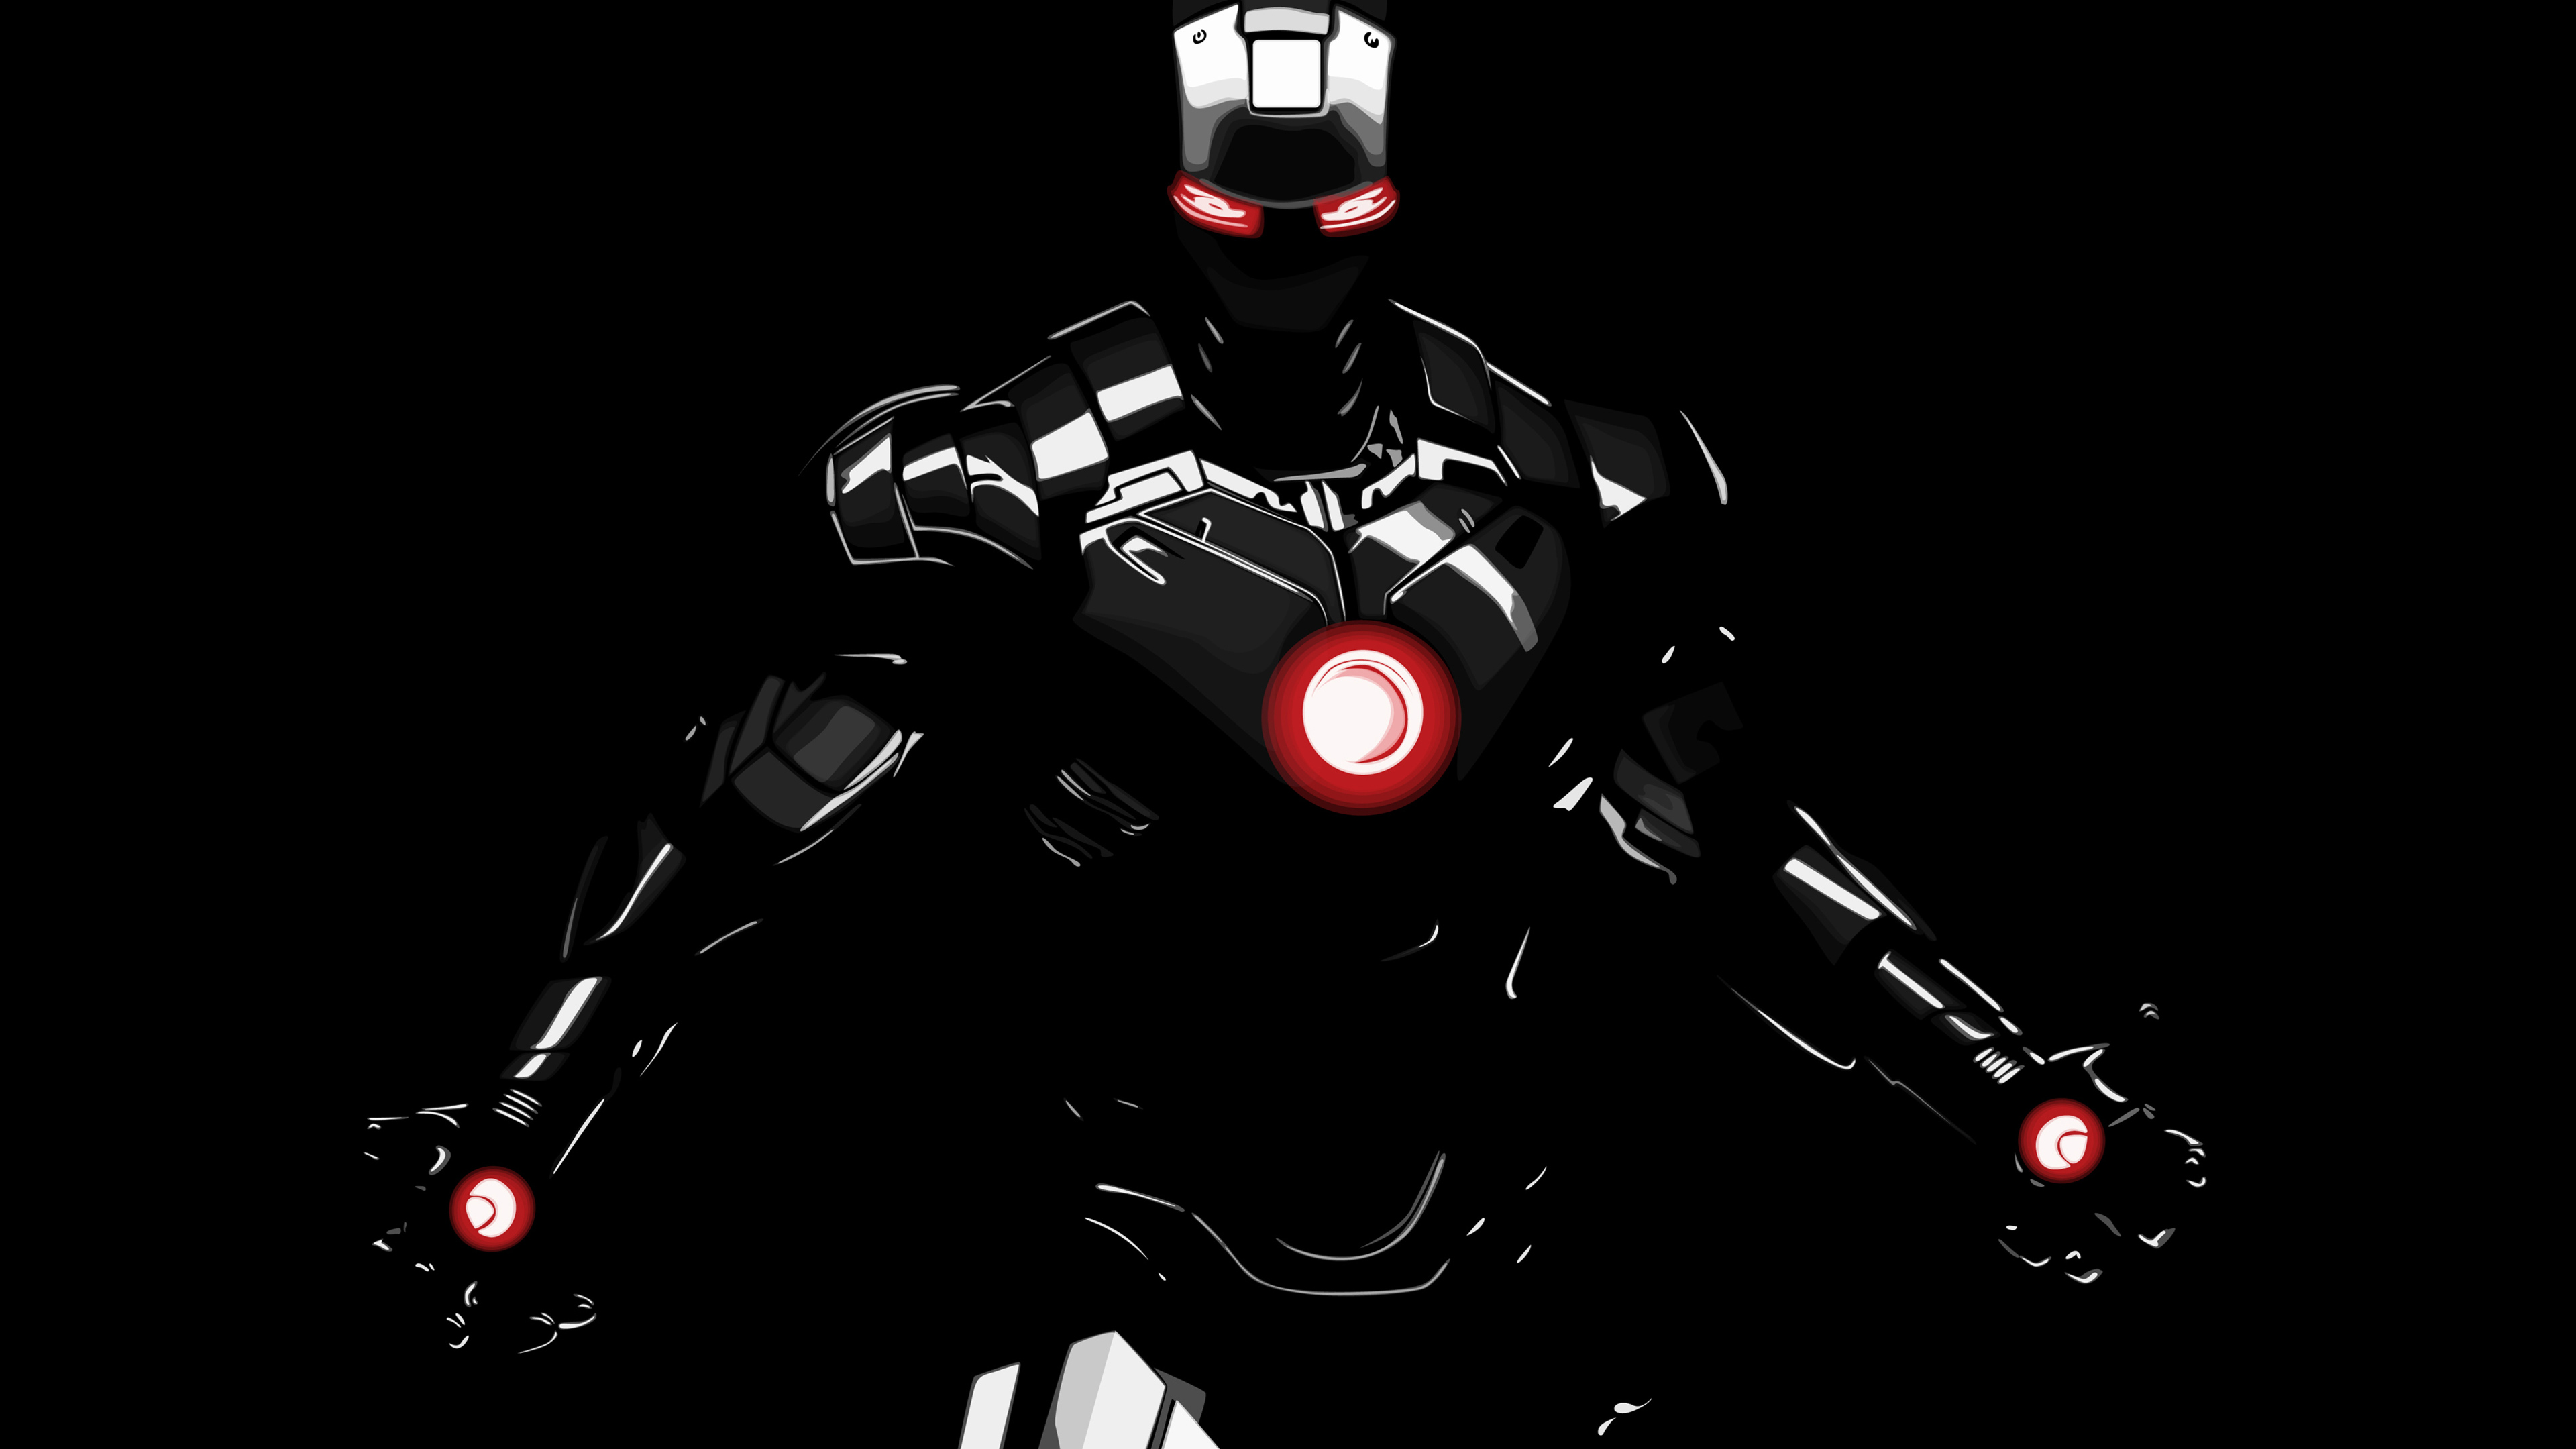 dark iron man 1539452753 - Dark Iron Man - superheroes wallpapers, iron man wallpapers, hd-wallpapers, digital art wallpapers, behance wallpapers, artwork wallpapers, artist wallpapers, 4k-wallpapers